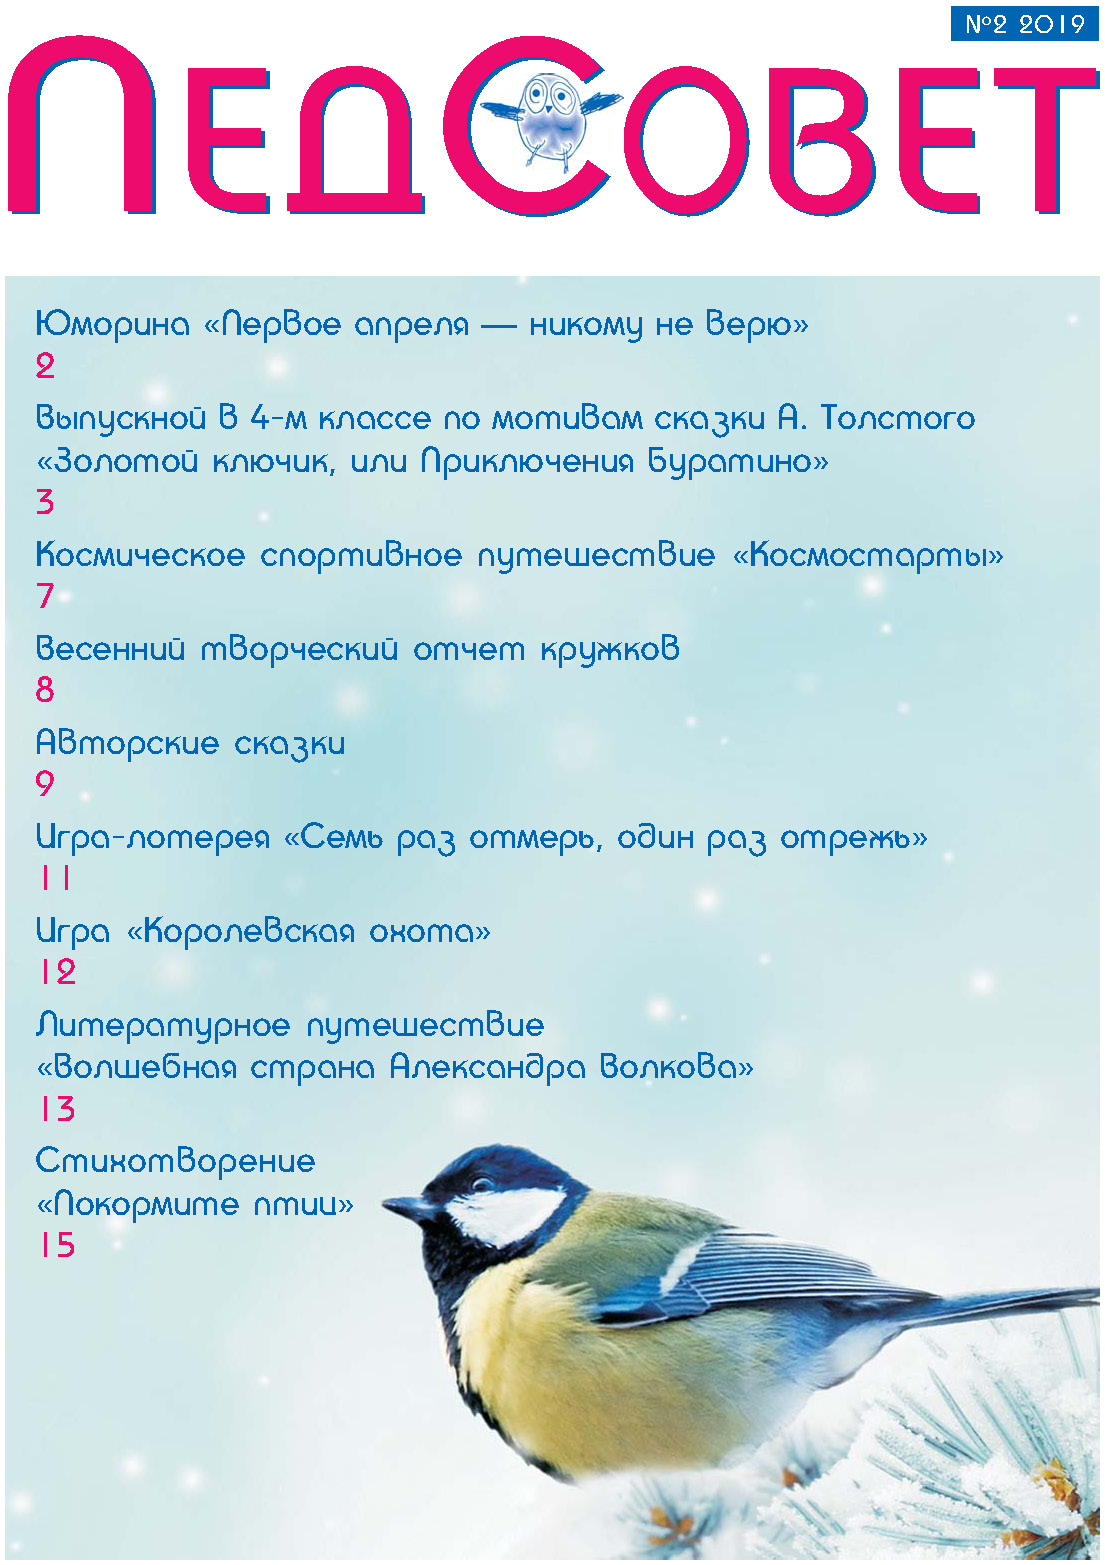 Педсовет №2/2019